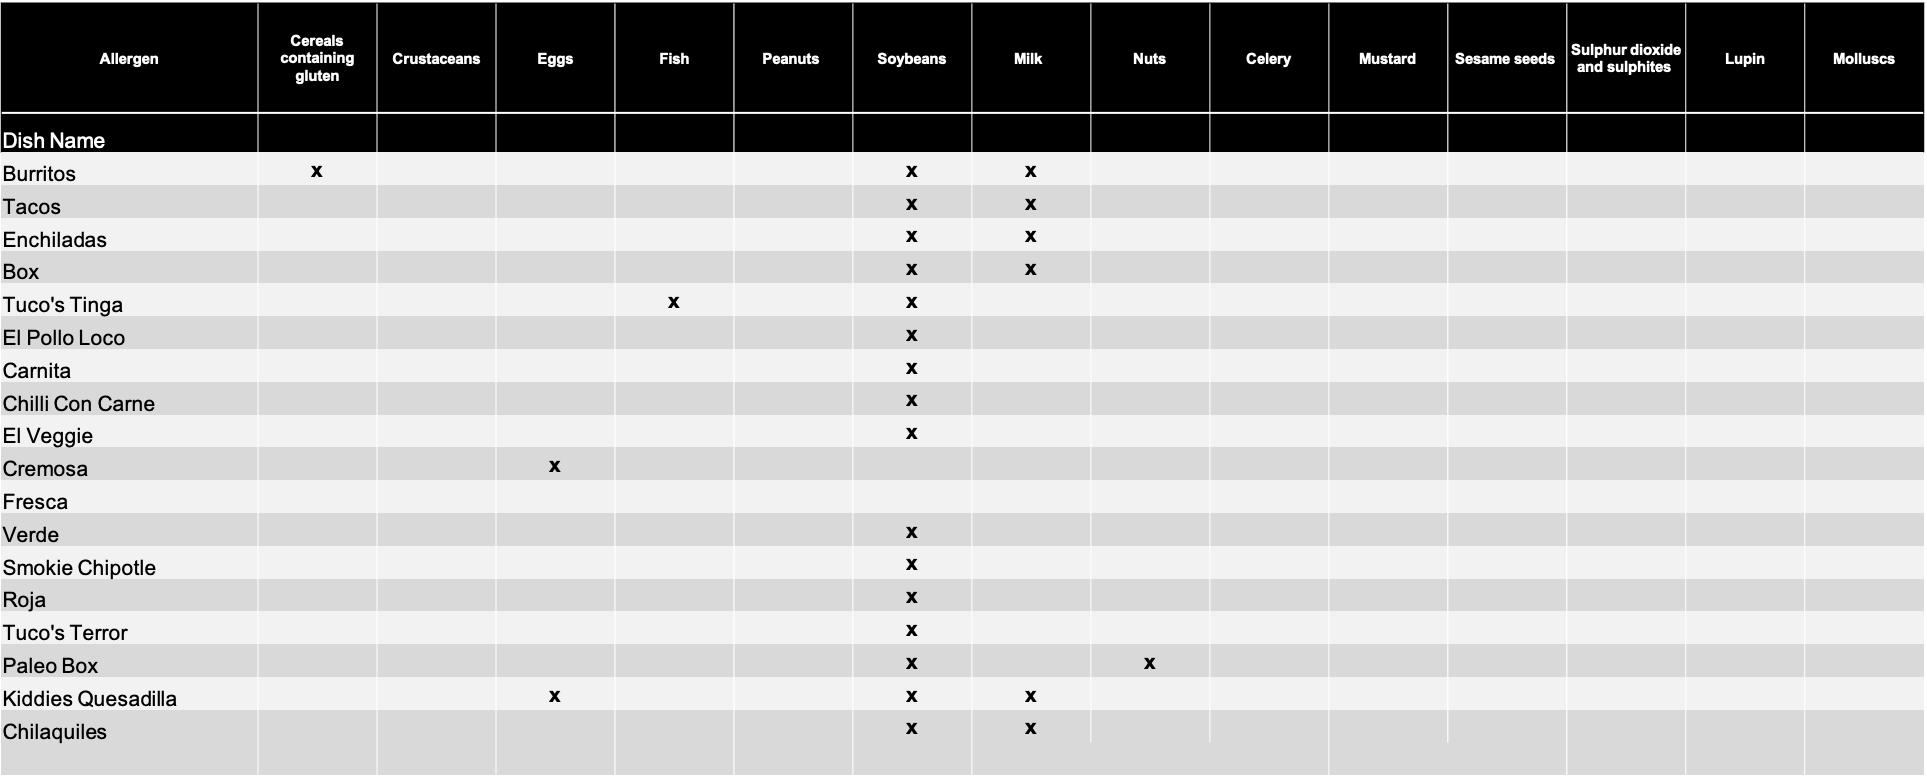 TUCOS ALLERGEN CHART DESCRIPTION